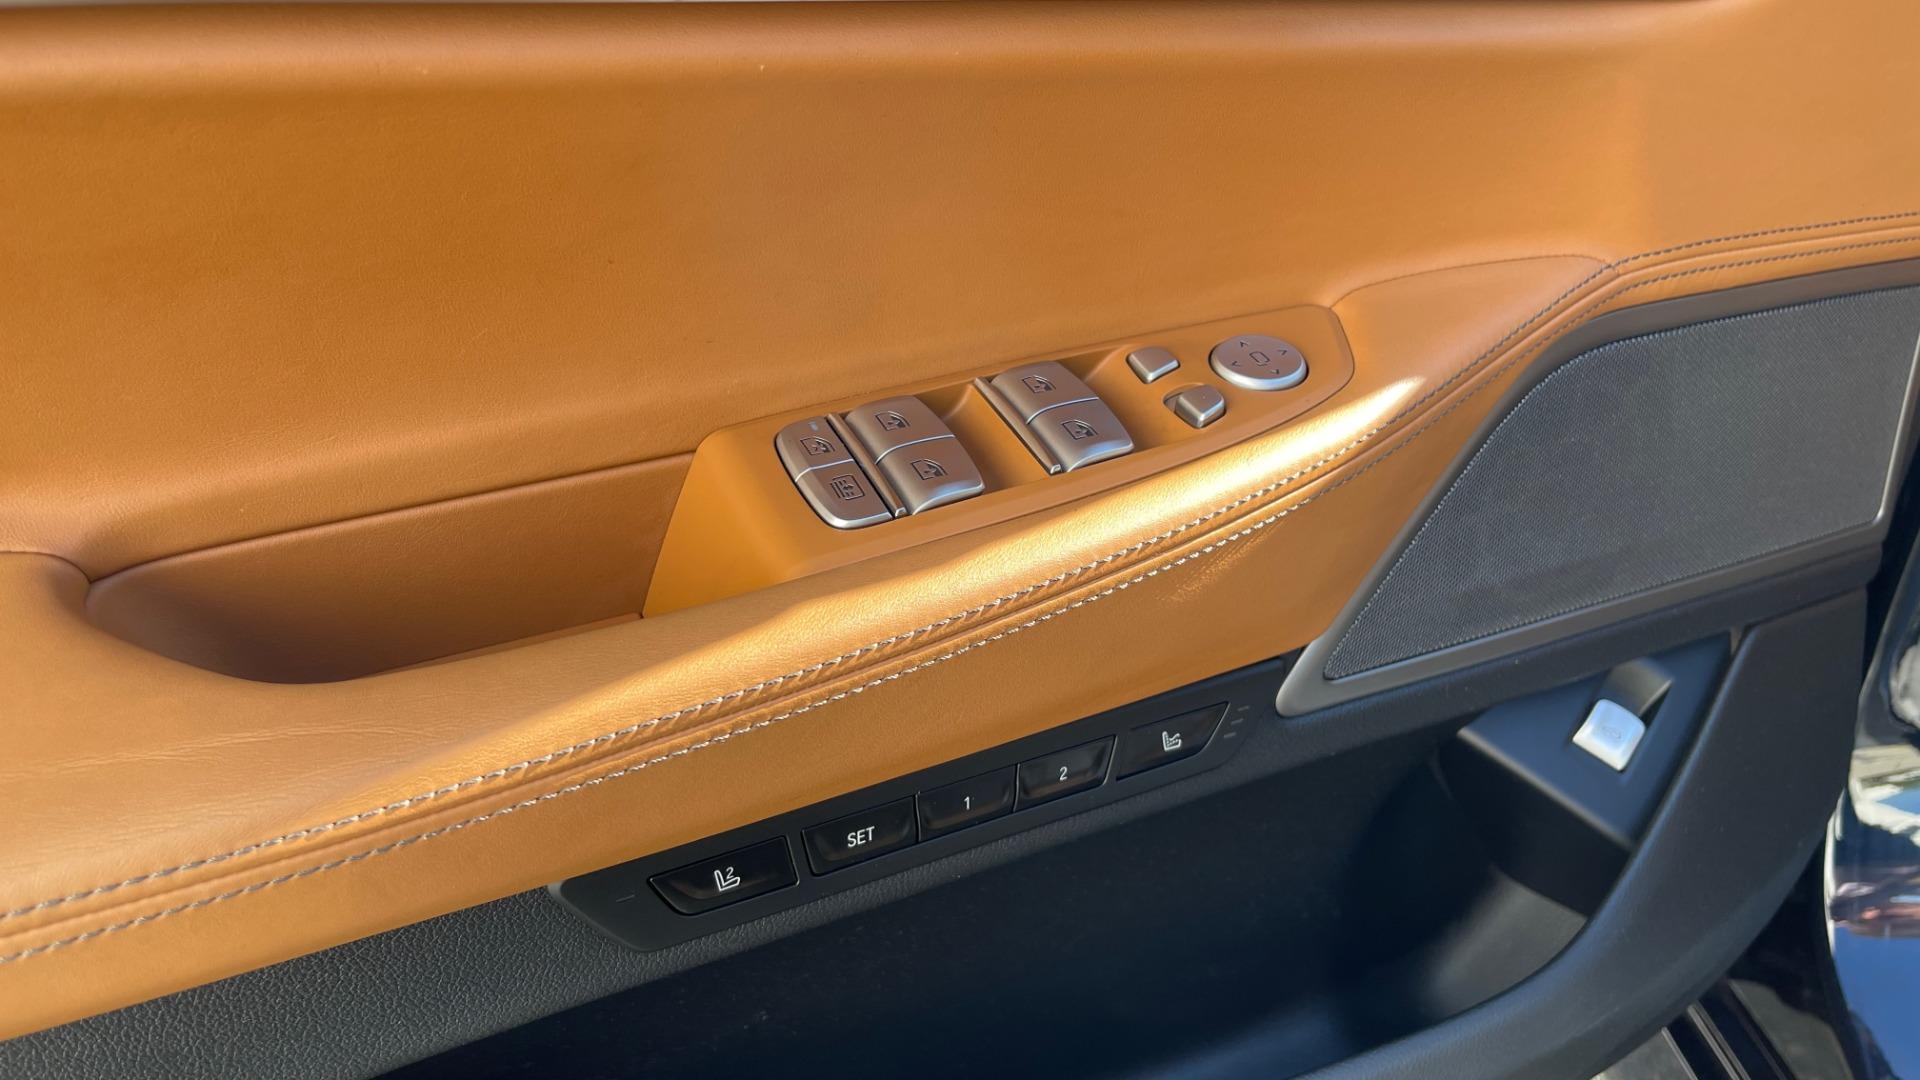 Used 2019 BMW 7 SERIES 750I XDRIVE M-SPORT / EXEC PKG / DRVR ASST PLUS / CLD WTHR / PAR for sale $60,995 at Formula Imports in Charlotte NC 28227 24